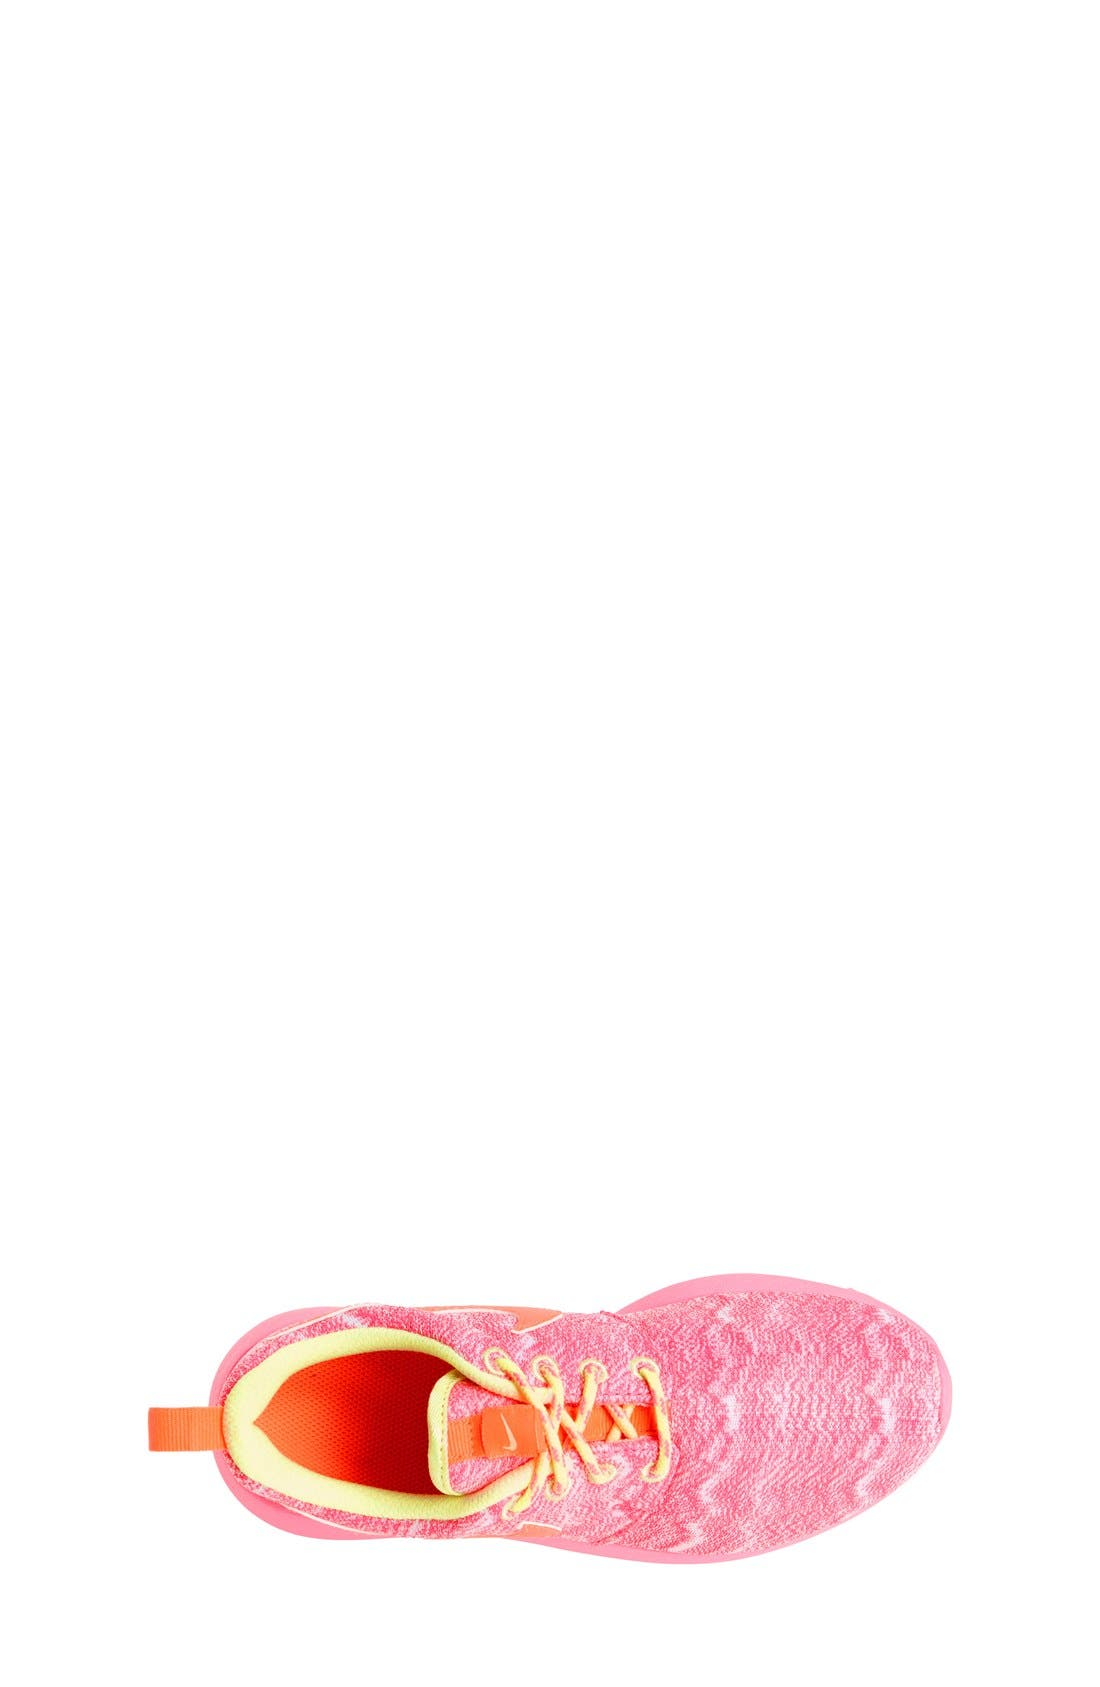 'Roshe Run' Athletic Shoe,                             Alternate thumbnail 103, color,